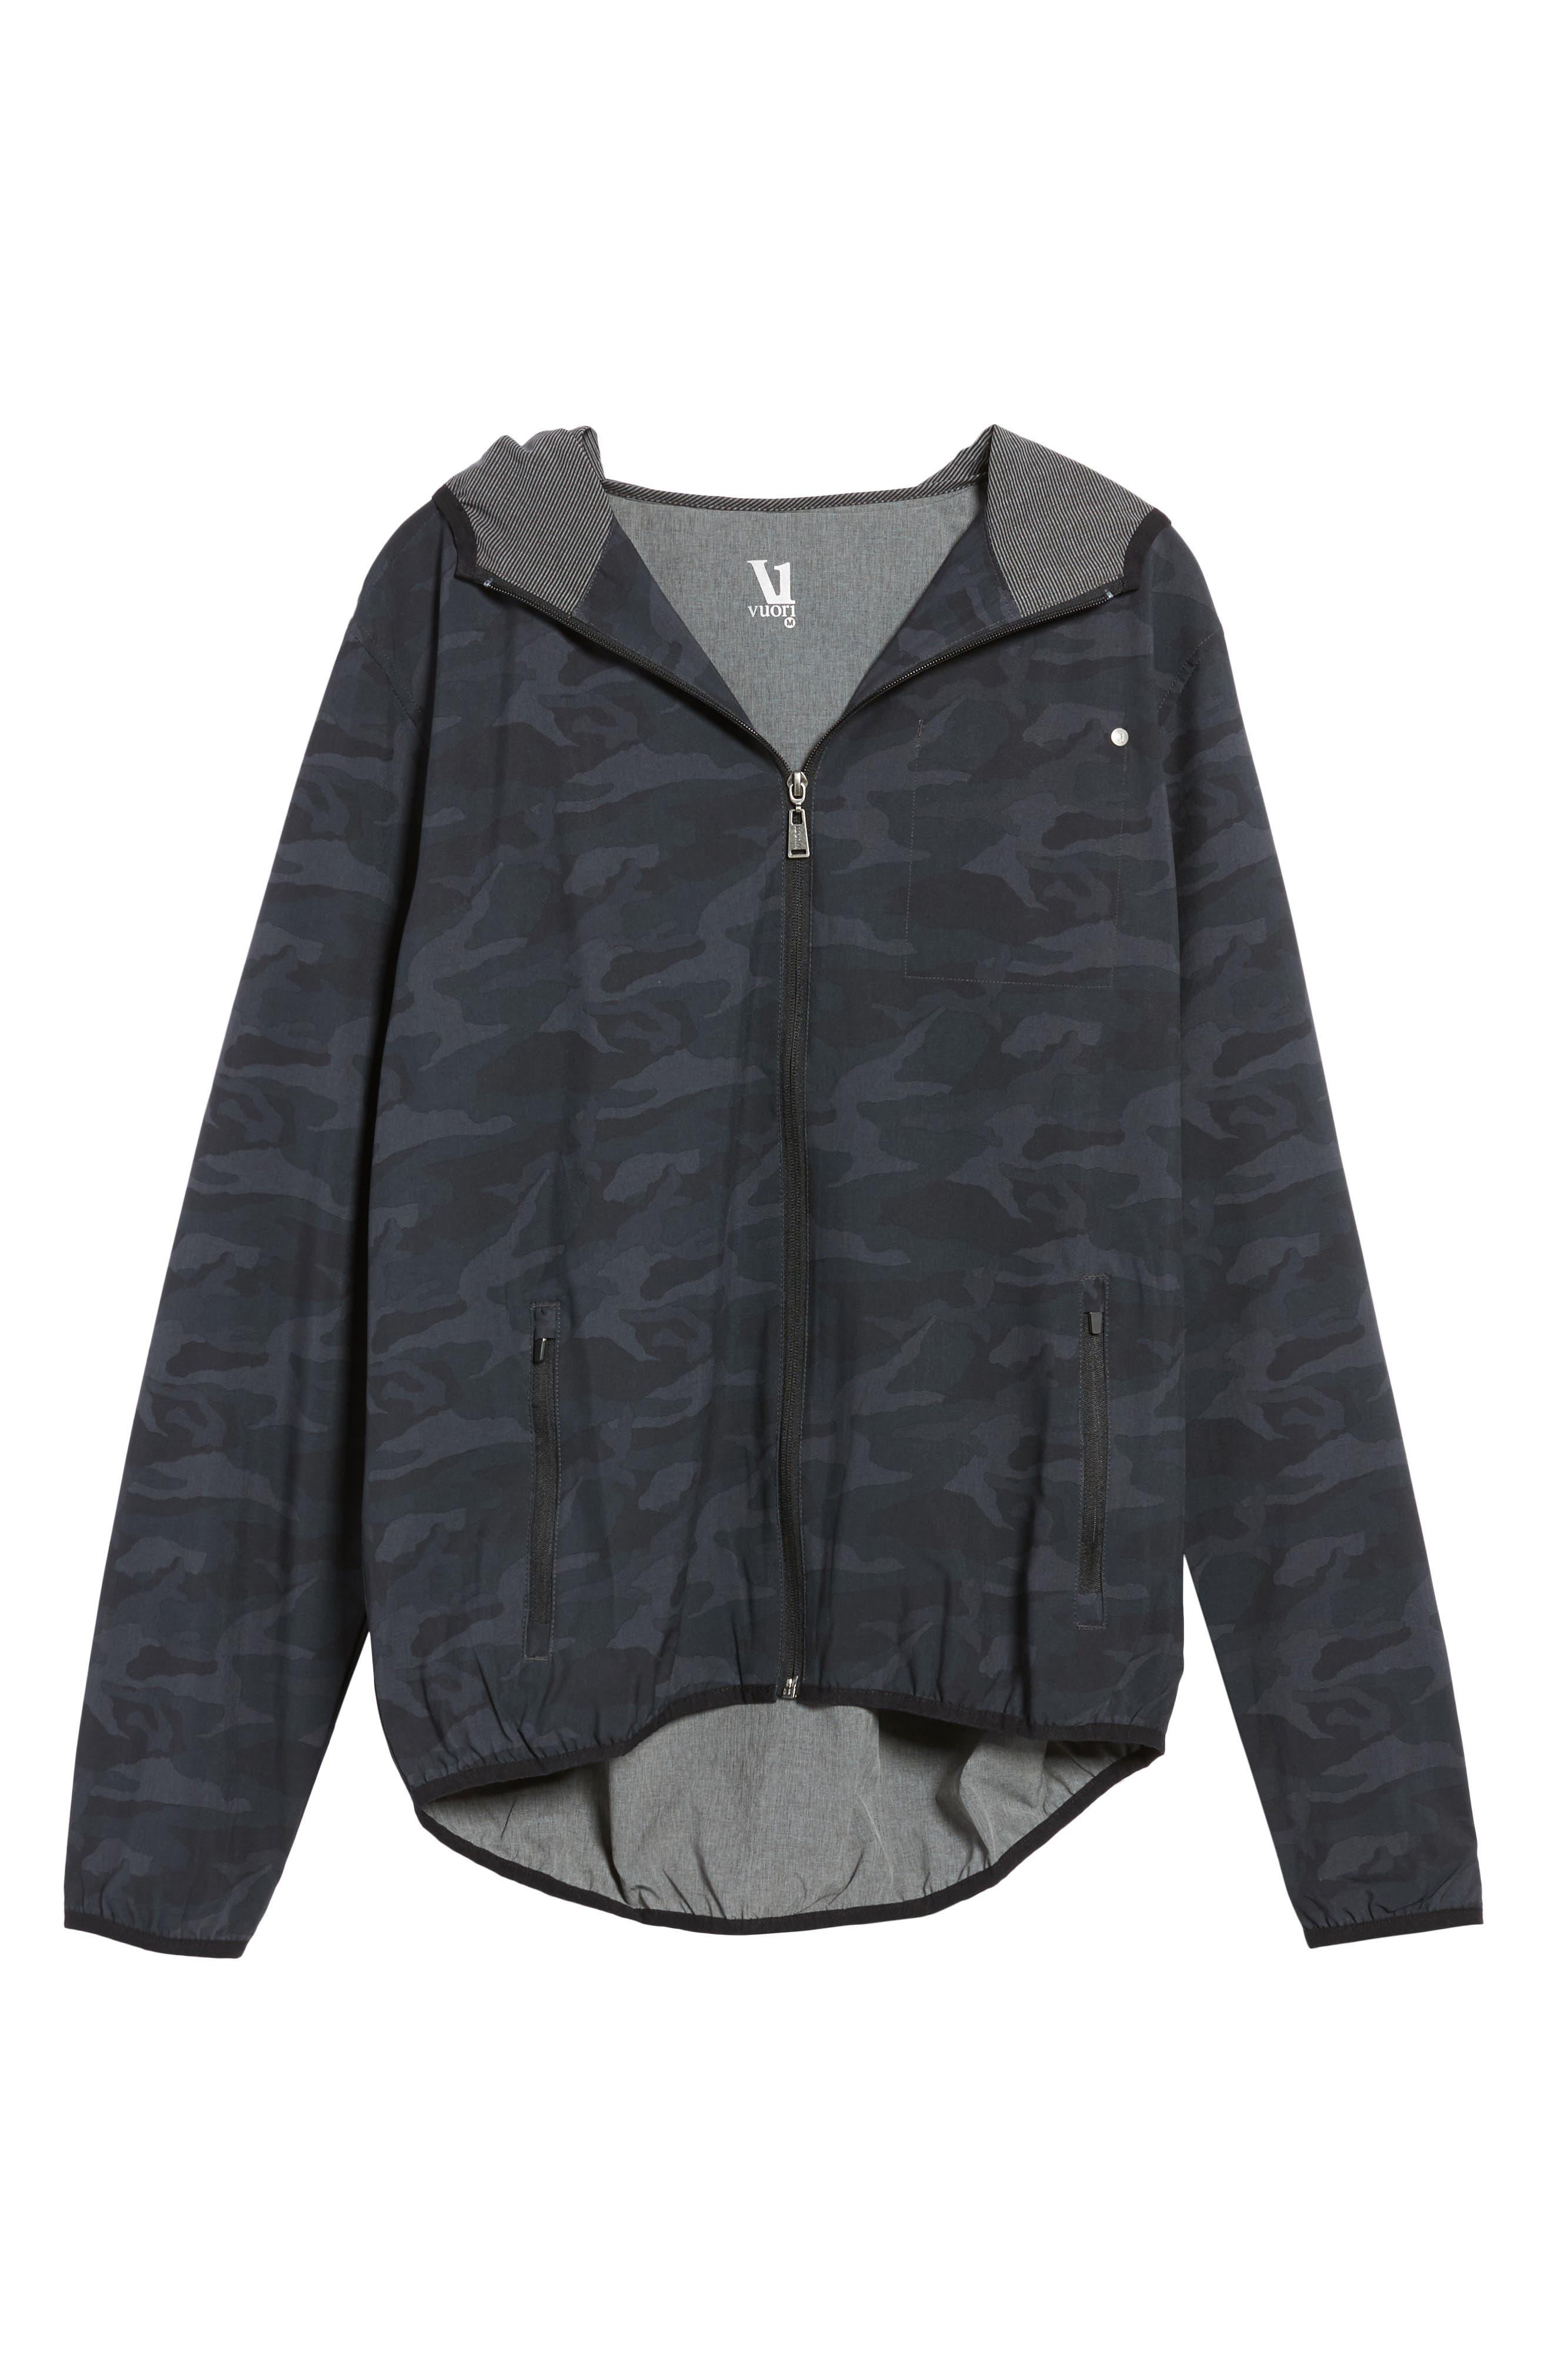 VUORI,                             Outdoor Training Shell Jacket,                             Alternate thumbnail 5, color,                             021